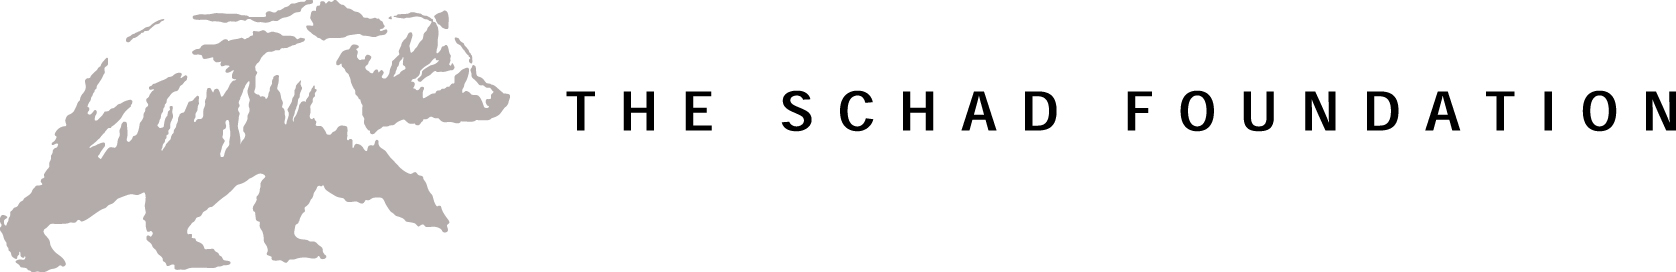 Schad Foundation logo